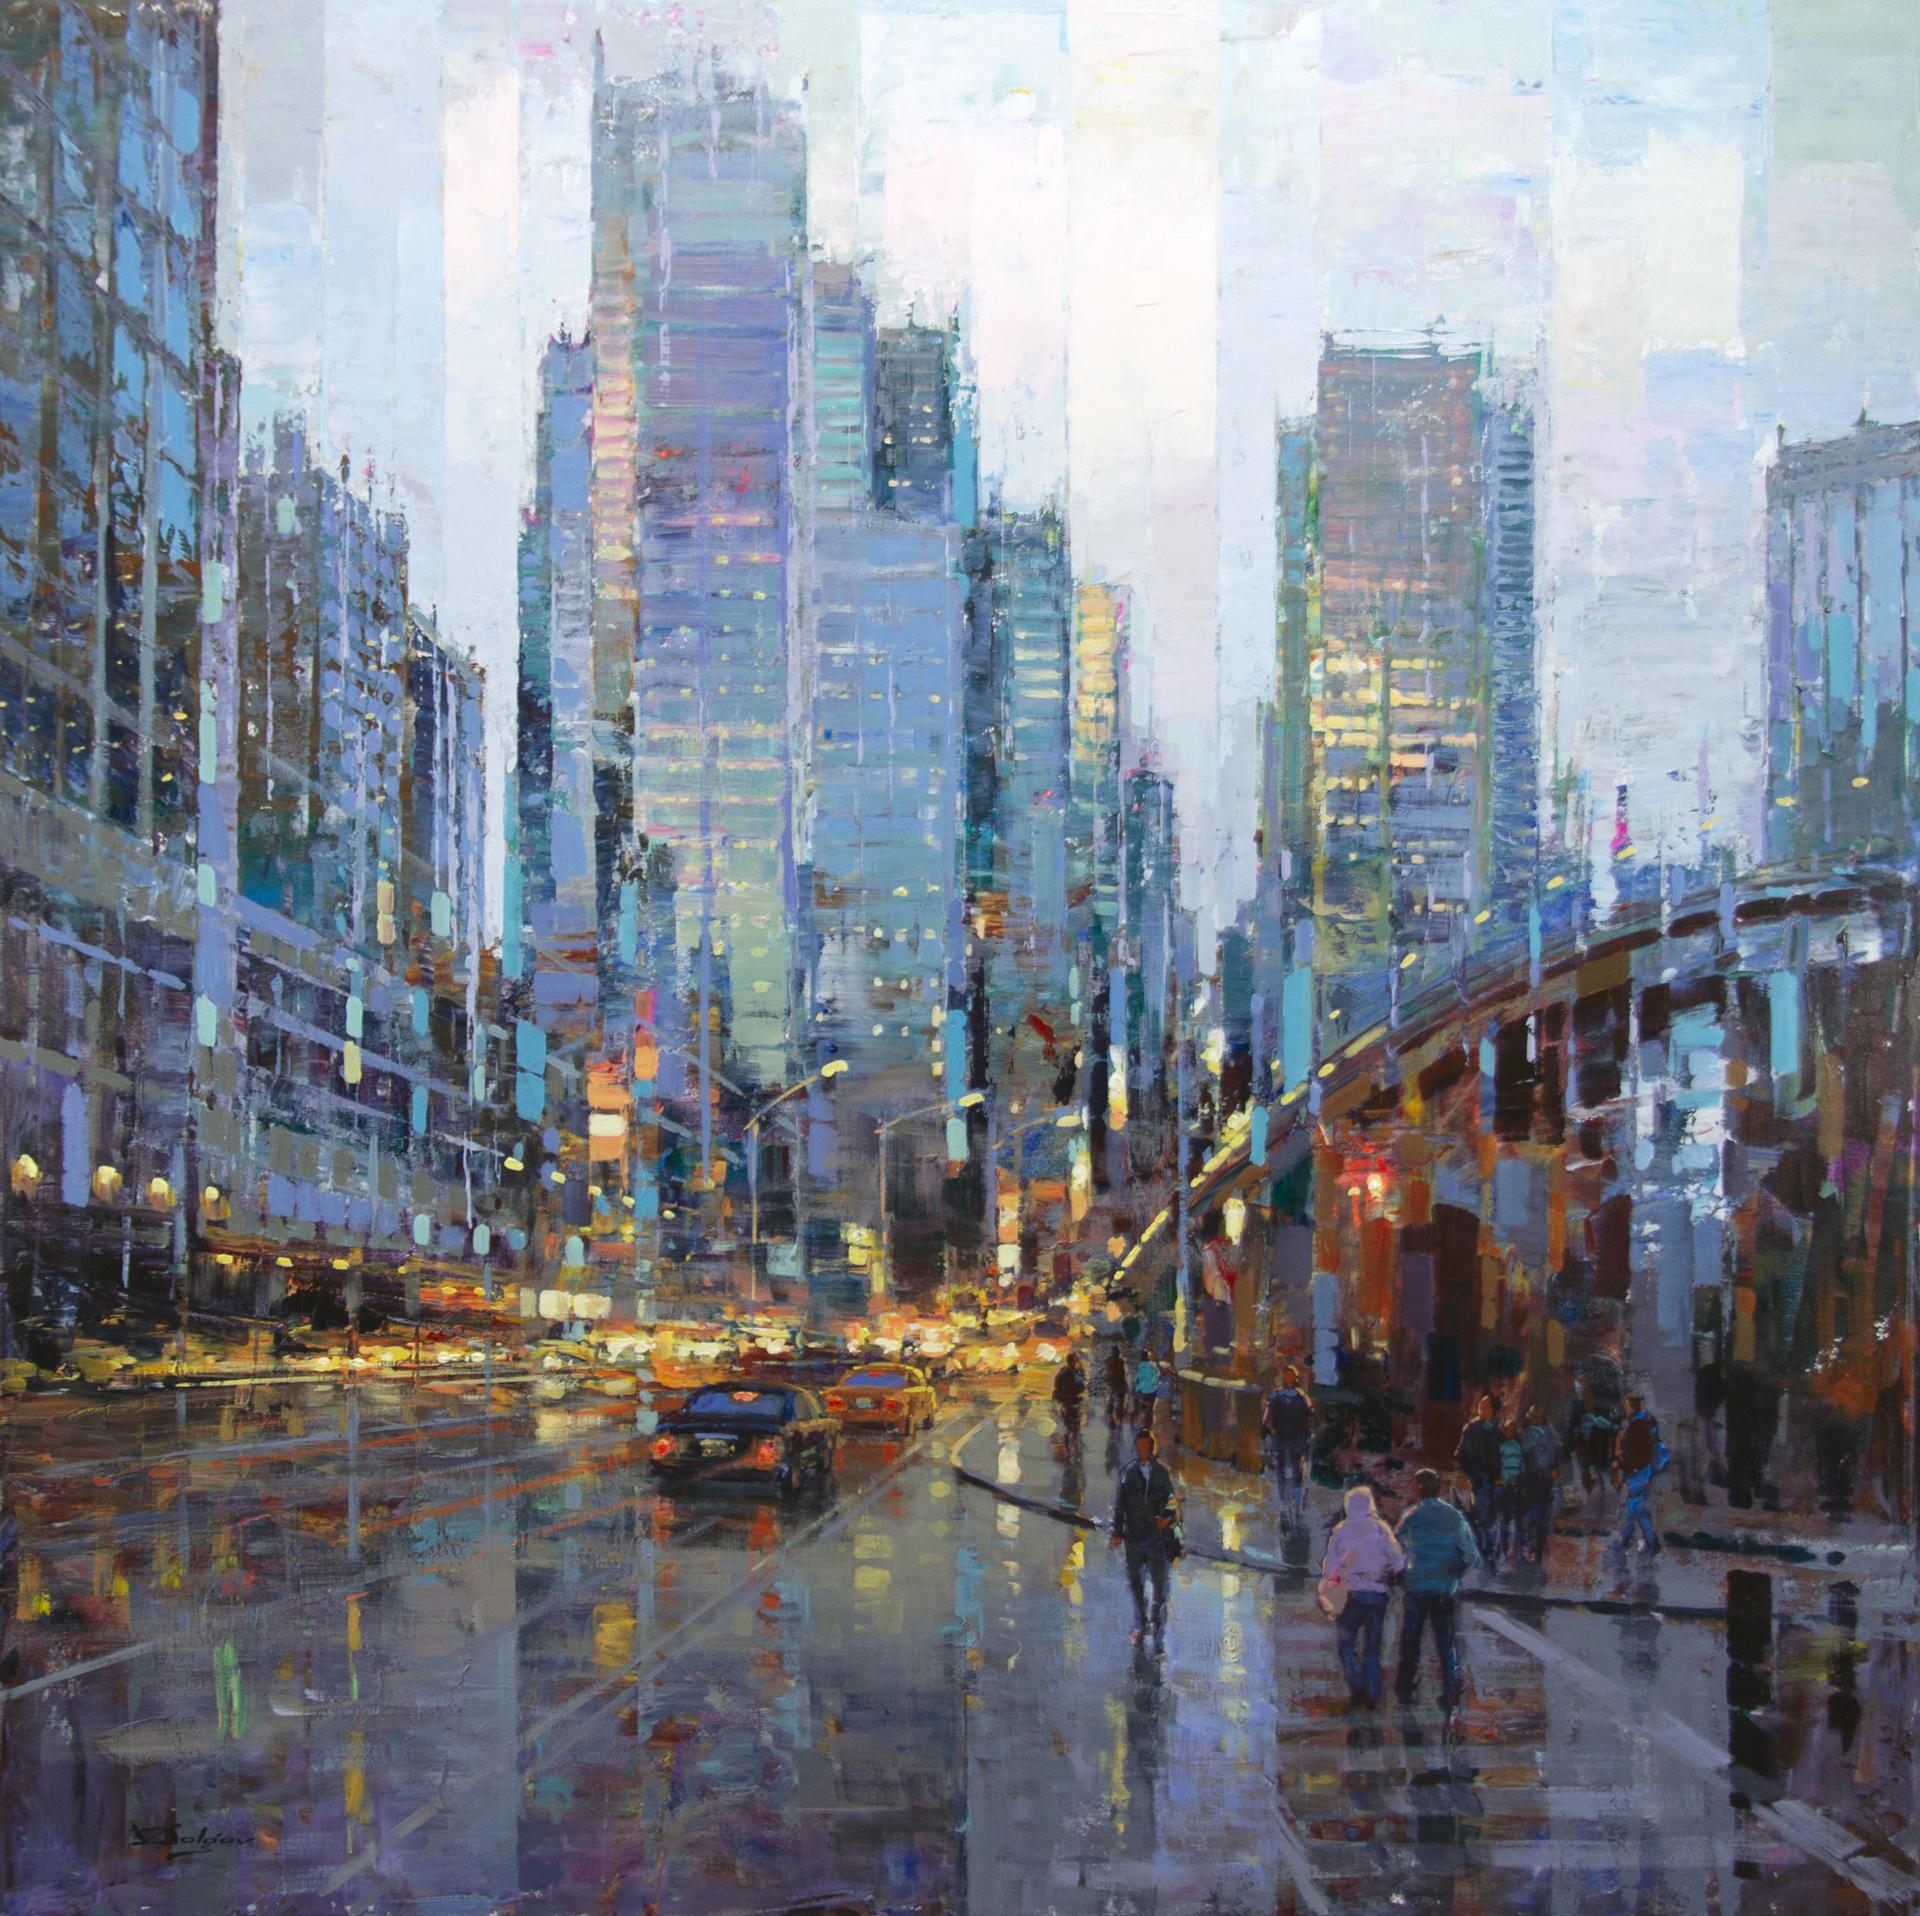 Streetlife in NYC by Vadim Dolgov